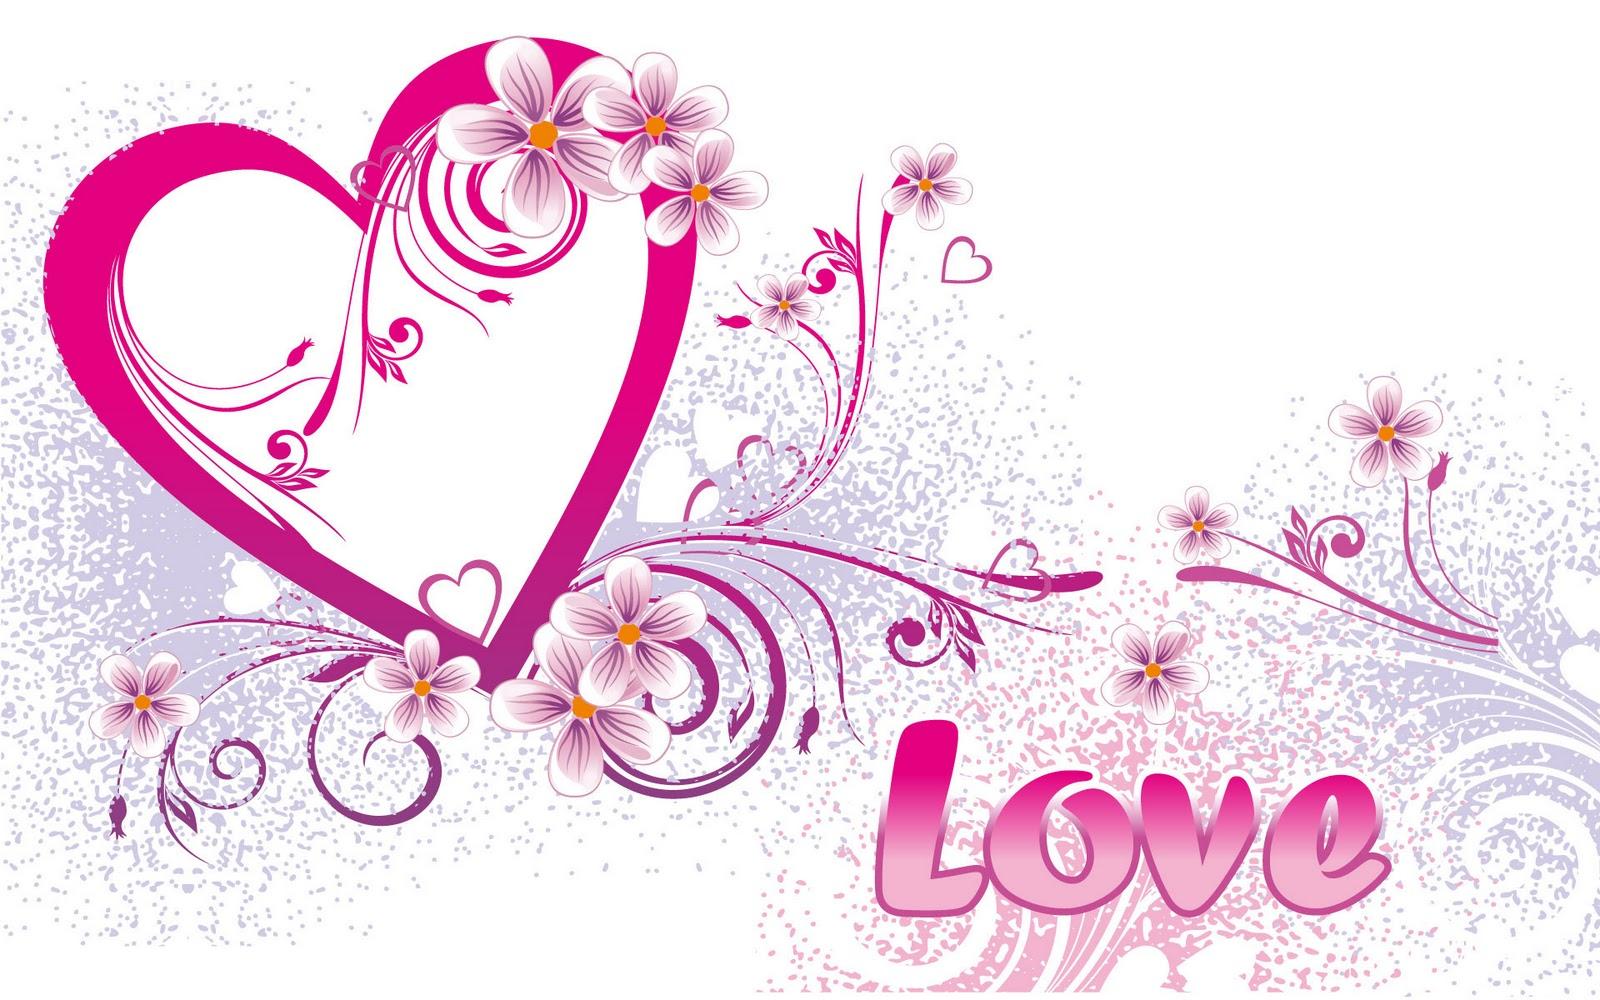 http://1.bp.blogspot.com/--wNlhnw4JUI/TnSVSRmJR5I/AAAAAAAAAv8/iVuDff4RGOQ/s1600/Love+Pictures+%252893%2529.jpg